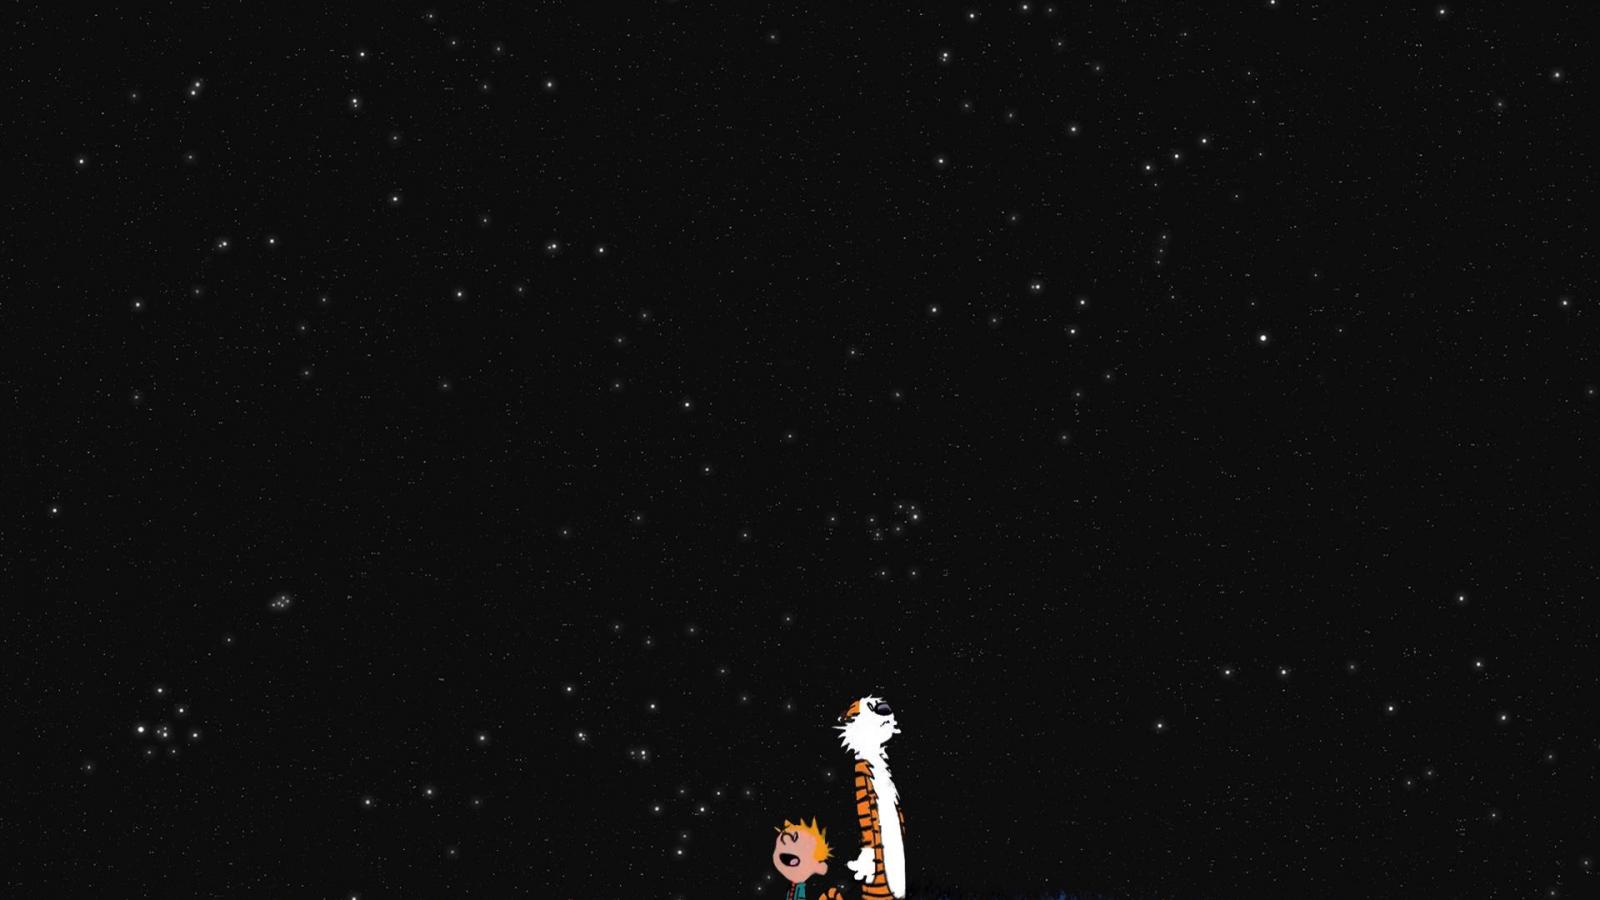 Free Download Calvin Hobbes Stars Wallpaper 194683 1920x1200 For